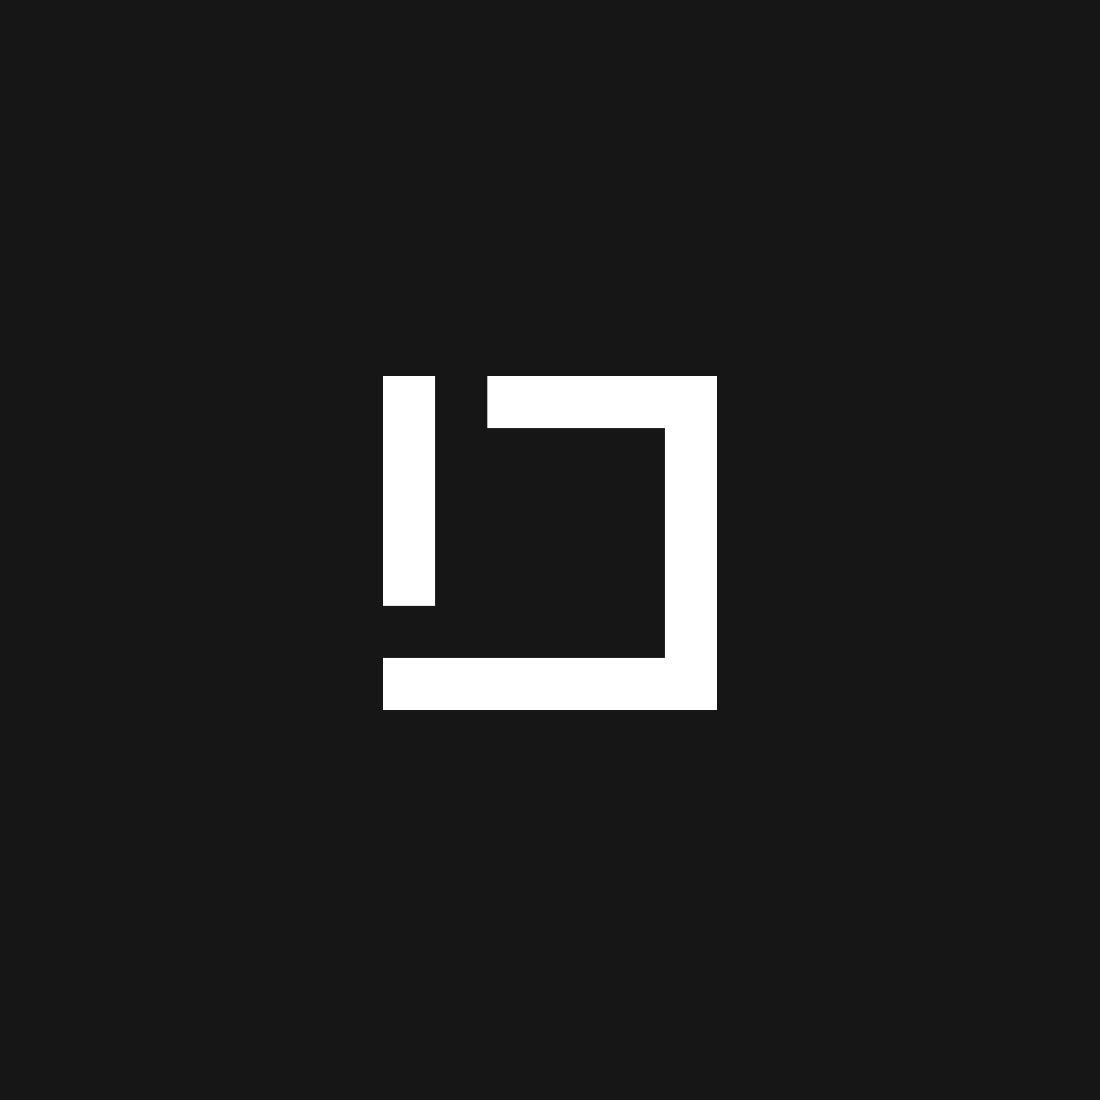 logo_caseArtboard 1 copy 21